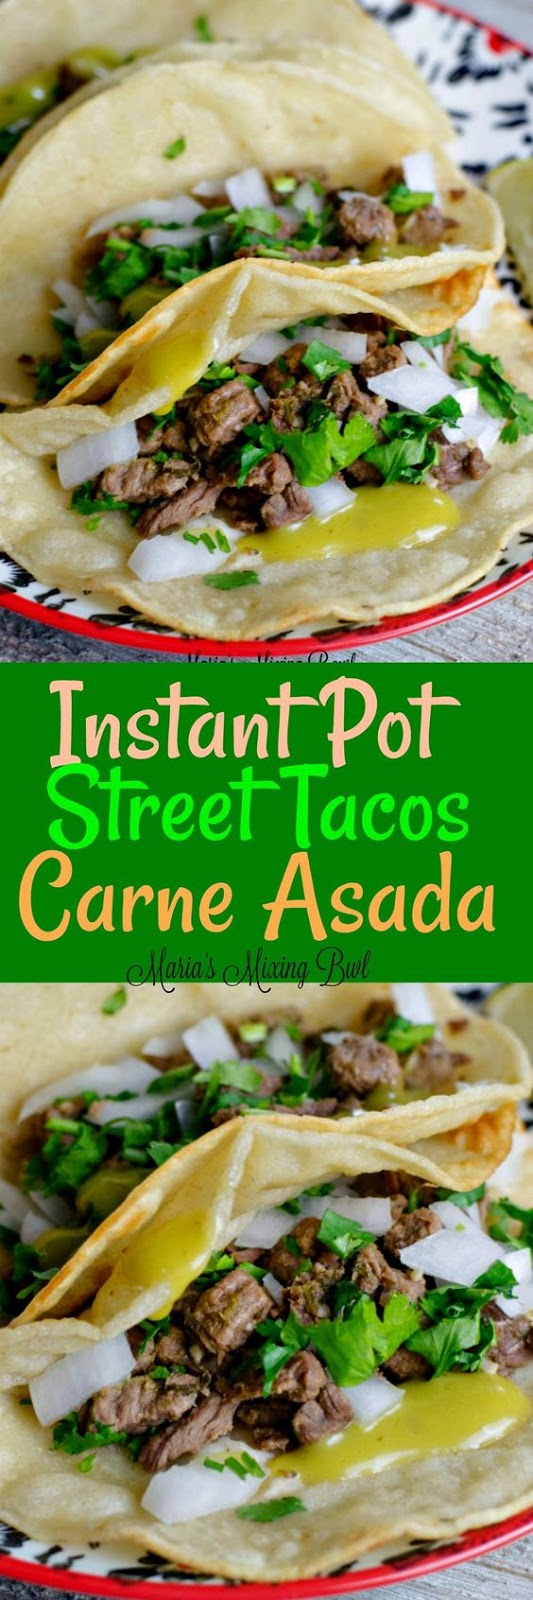 New Instant Pot Steak Tacos (Carne Asada)